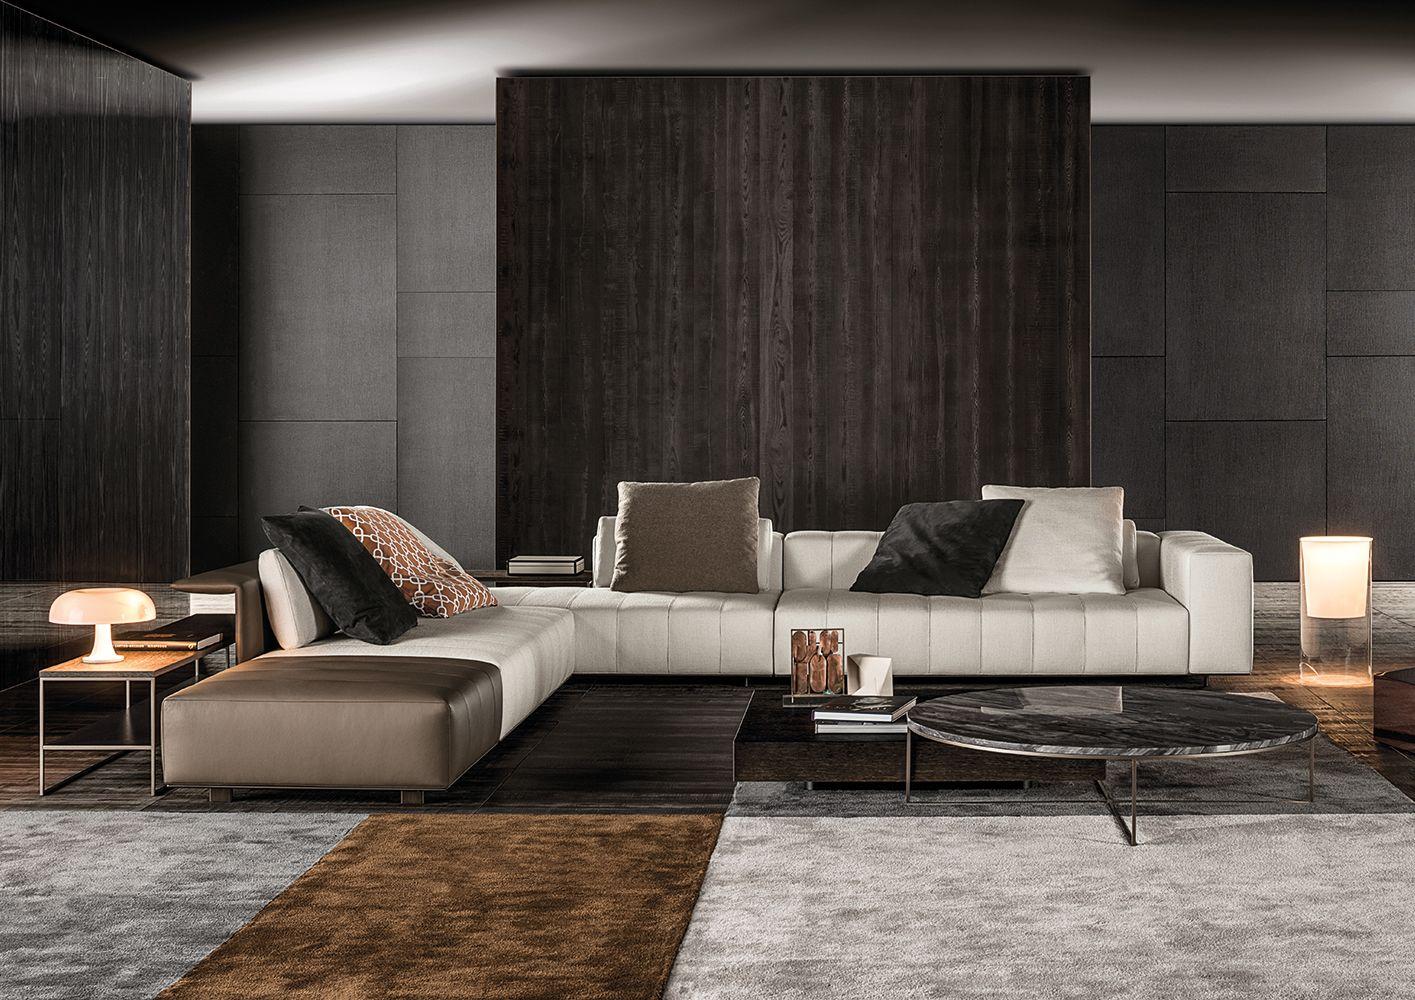 Minotti Ipad Freeman Tailor Sofas En Luxury Sofa Design Furniture Design Living Room Designs